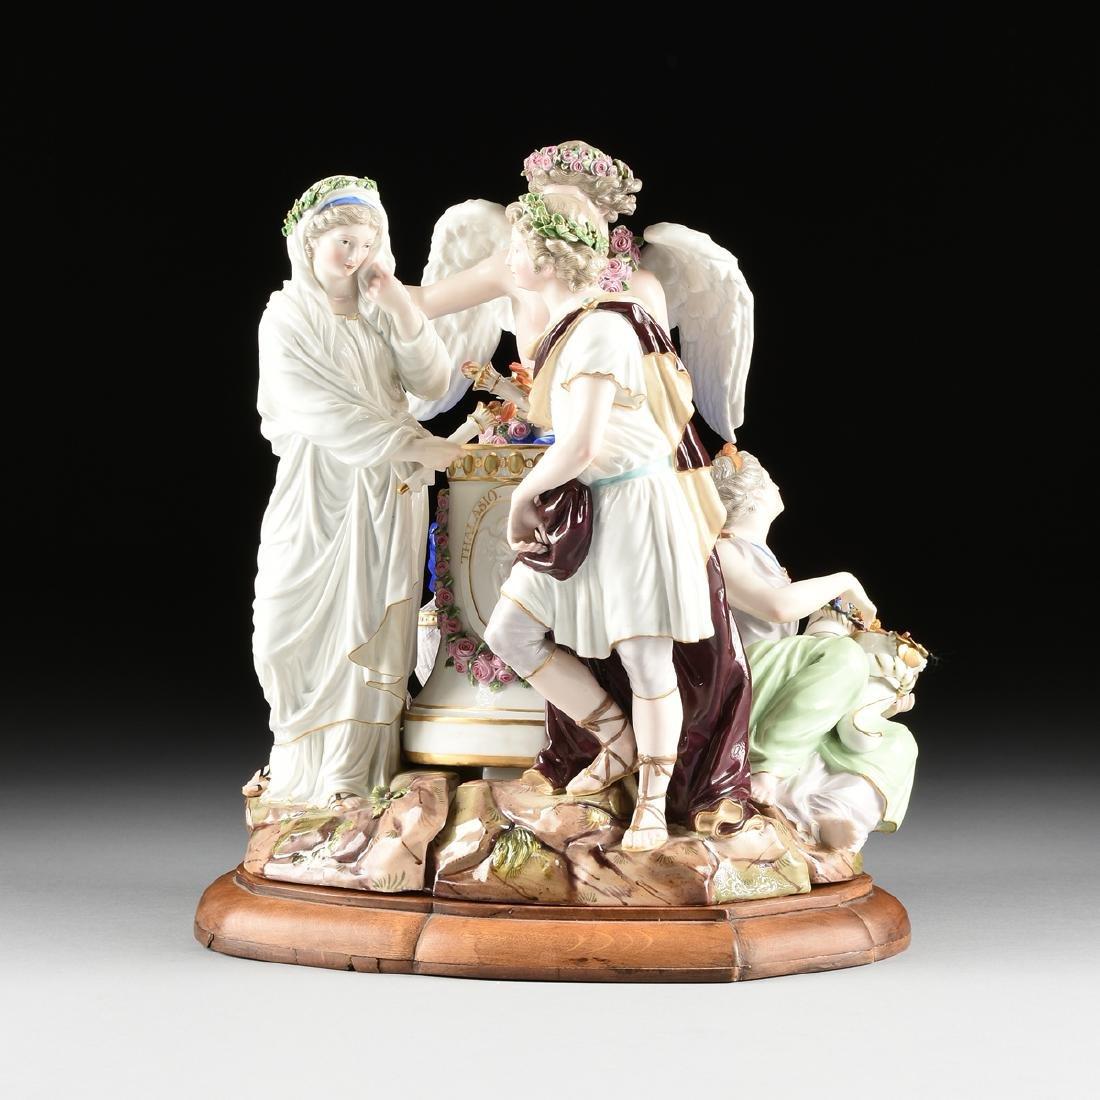 JOHANN CARL SCHOENHEIT (German 1730-1805) and MICHEL